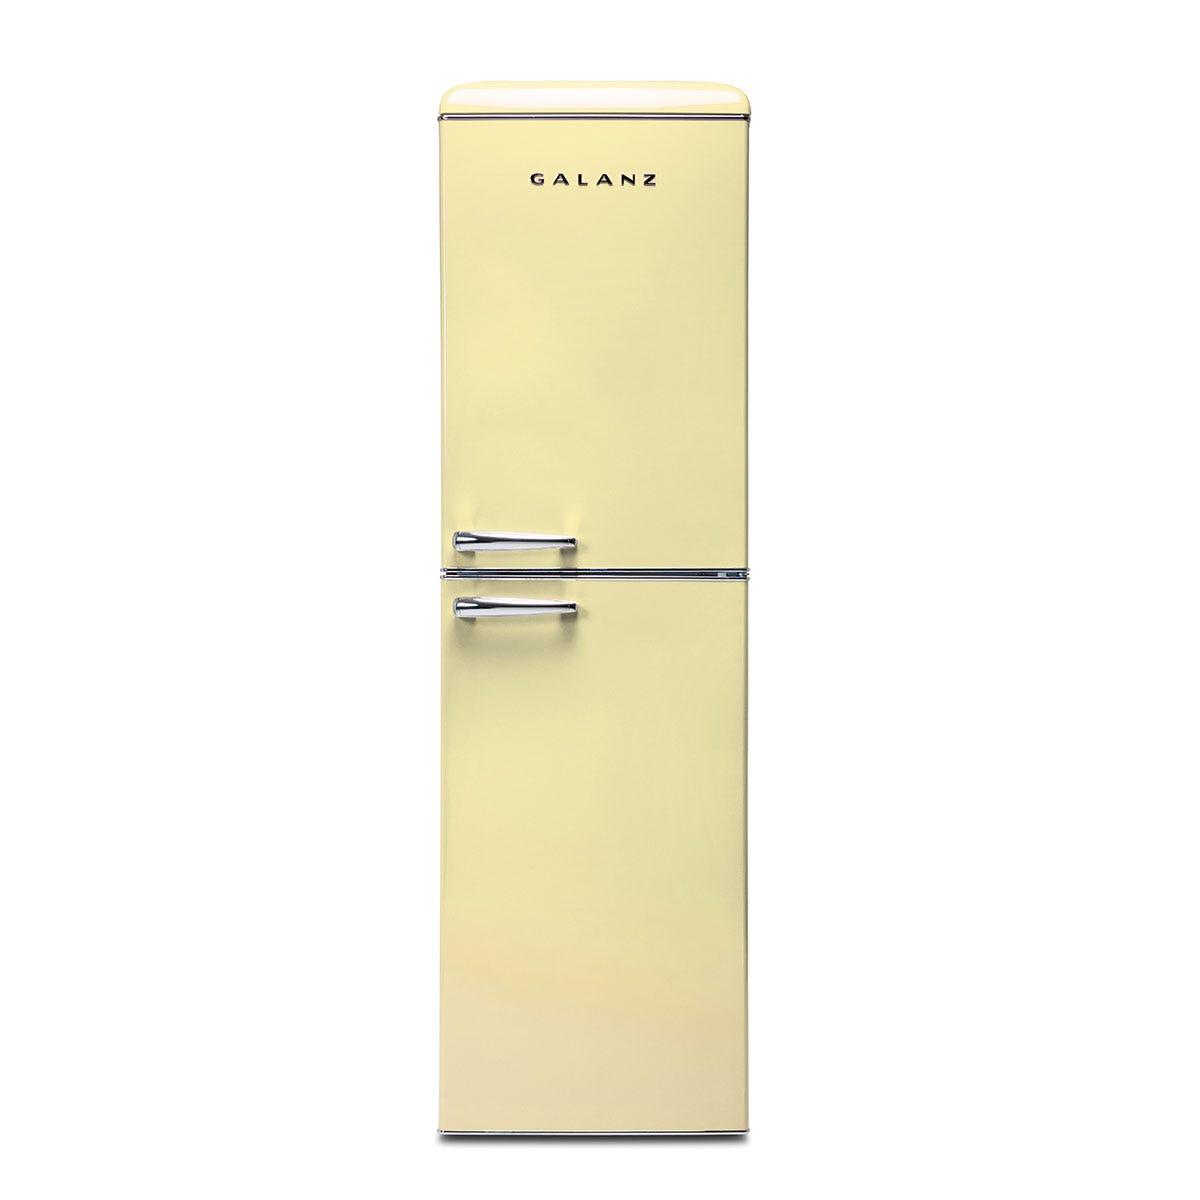 Galanz RFFK001C Frost Free 247L Freestanding Fridge Freezer - Cream